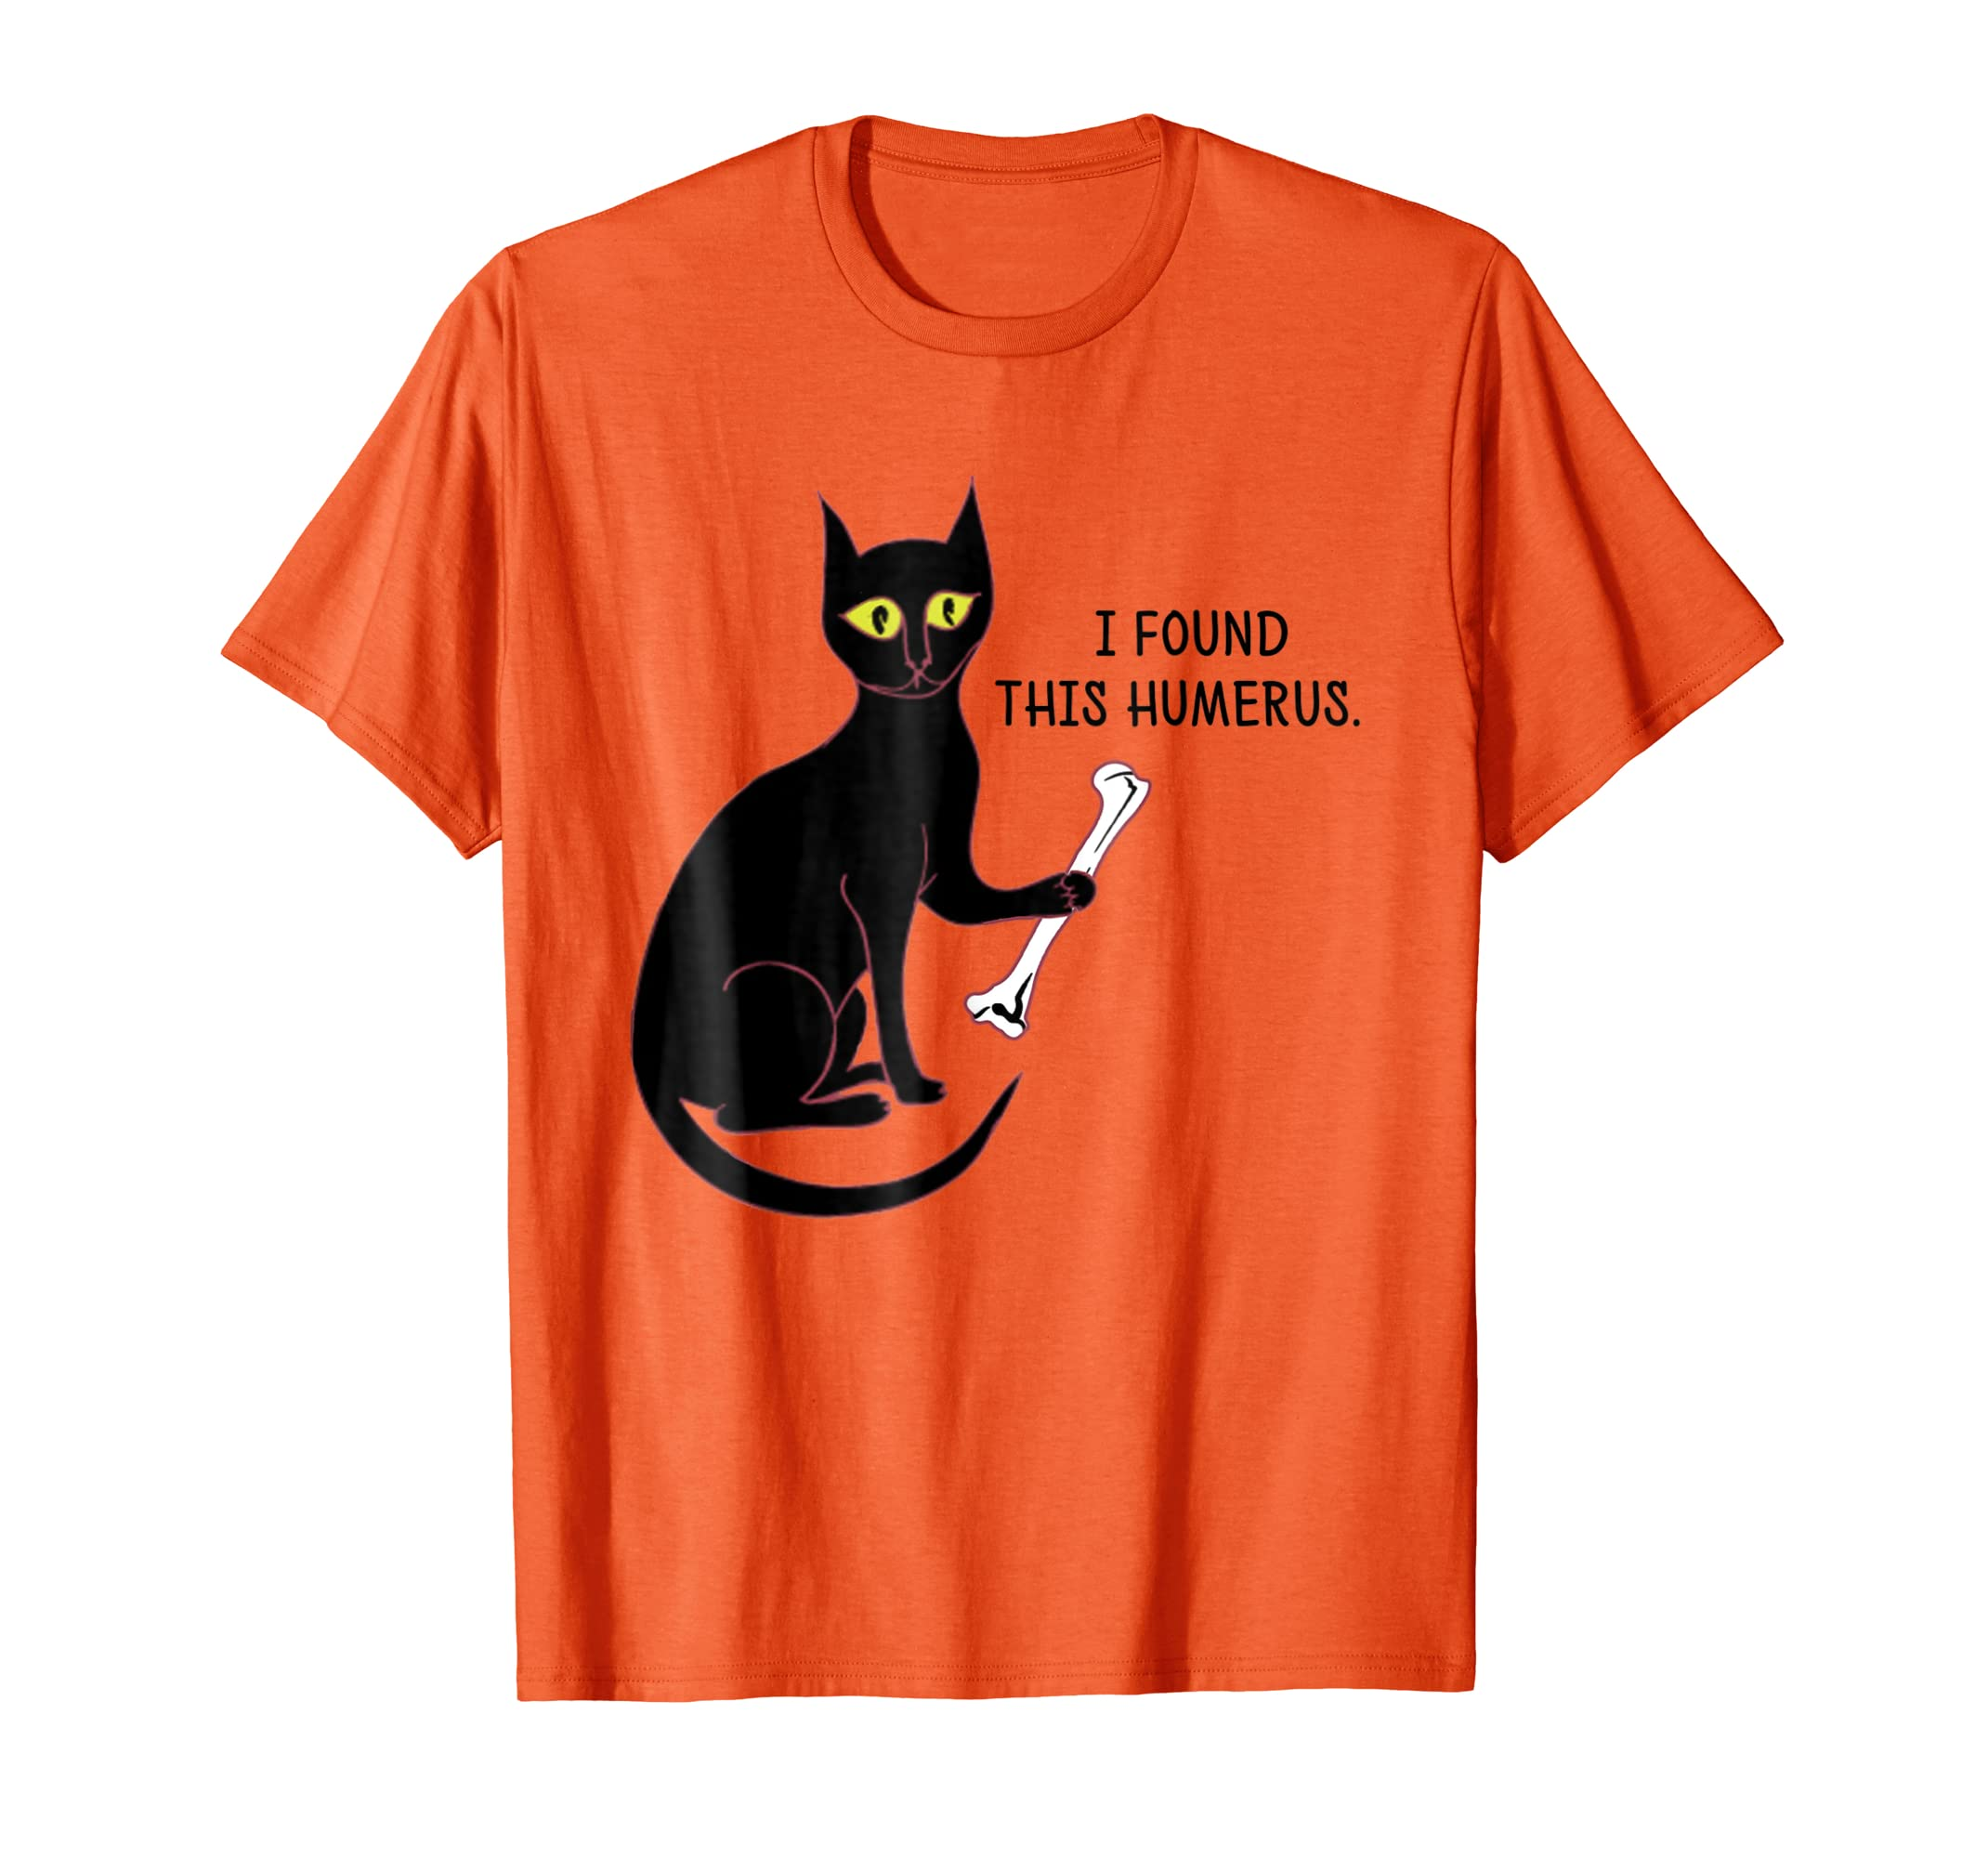 4867366c9 Amazon.com: I Found This Humerus Cats T Shirt Gift for Women Men: Clothing